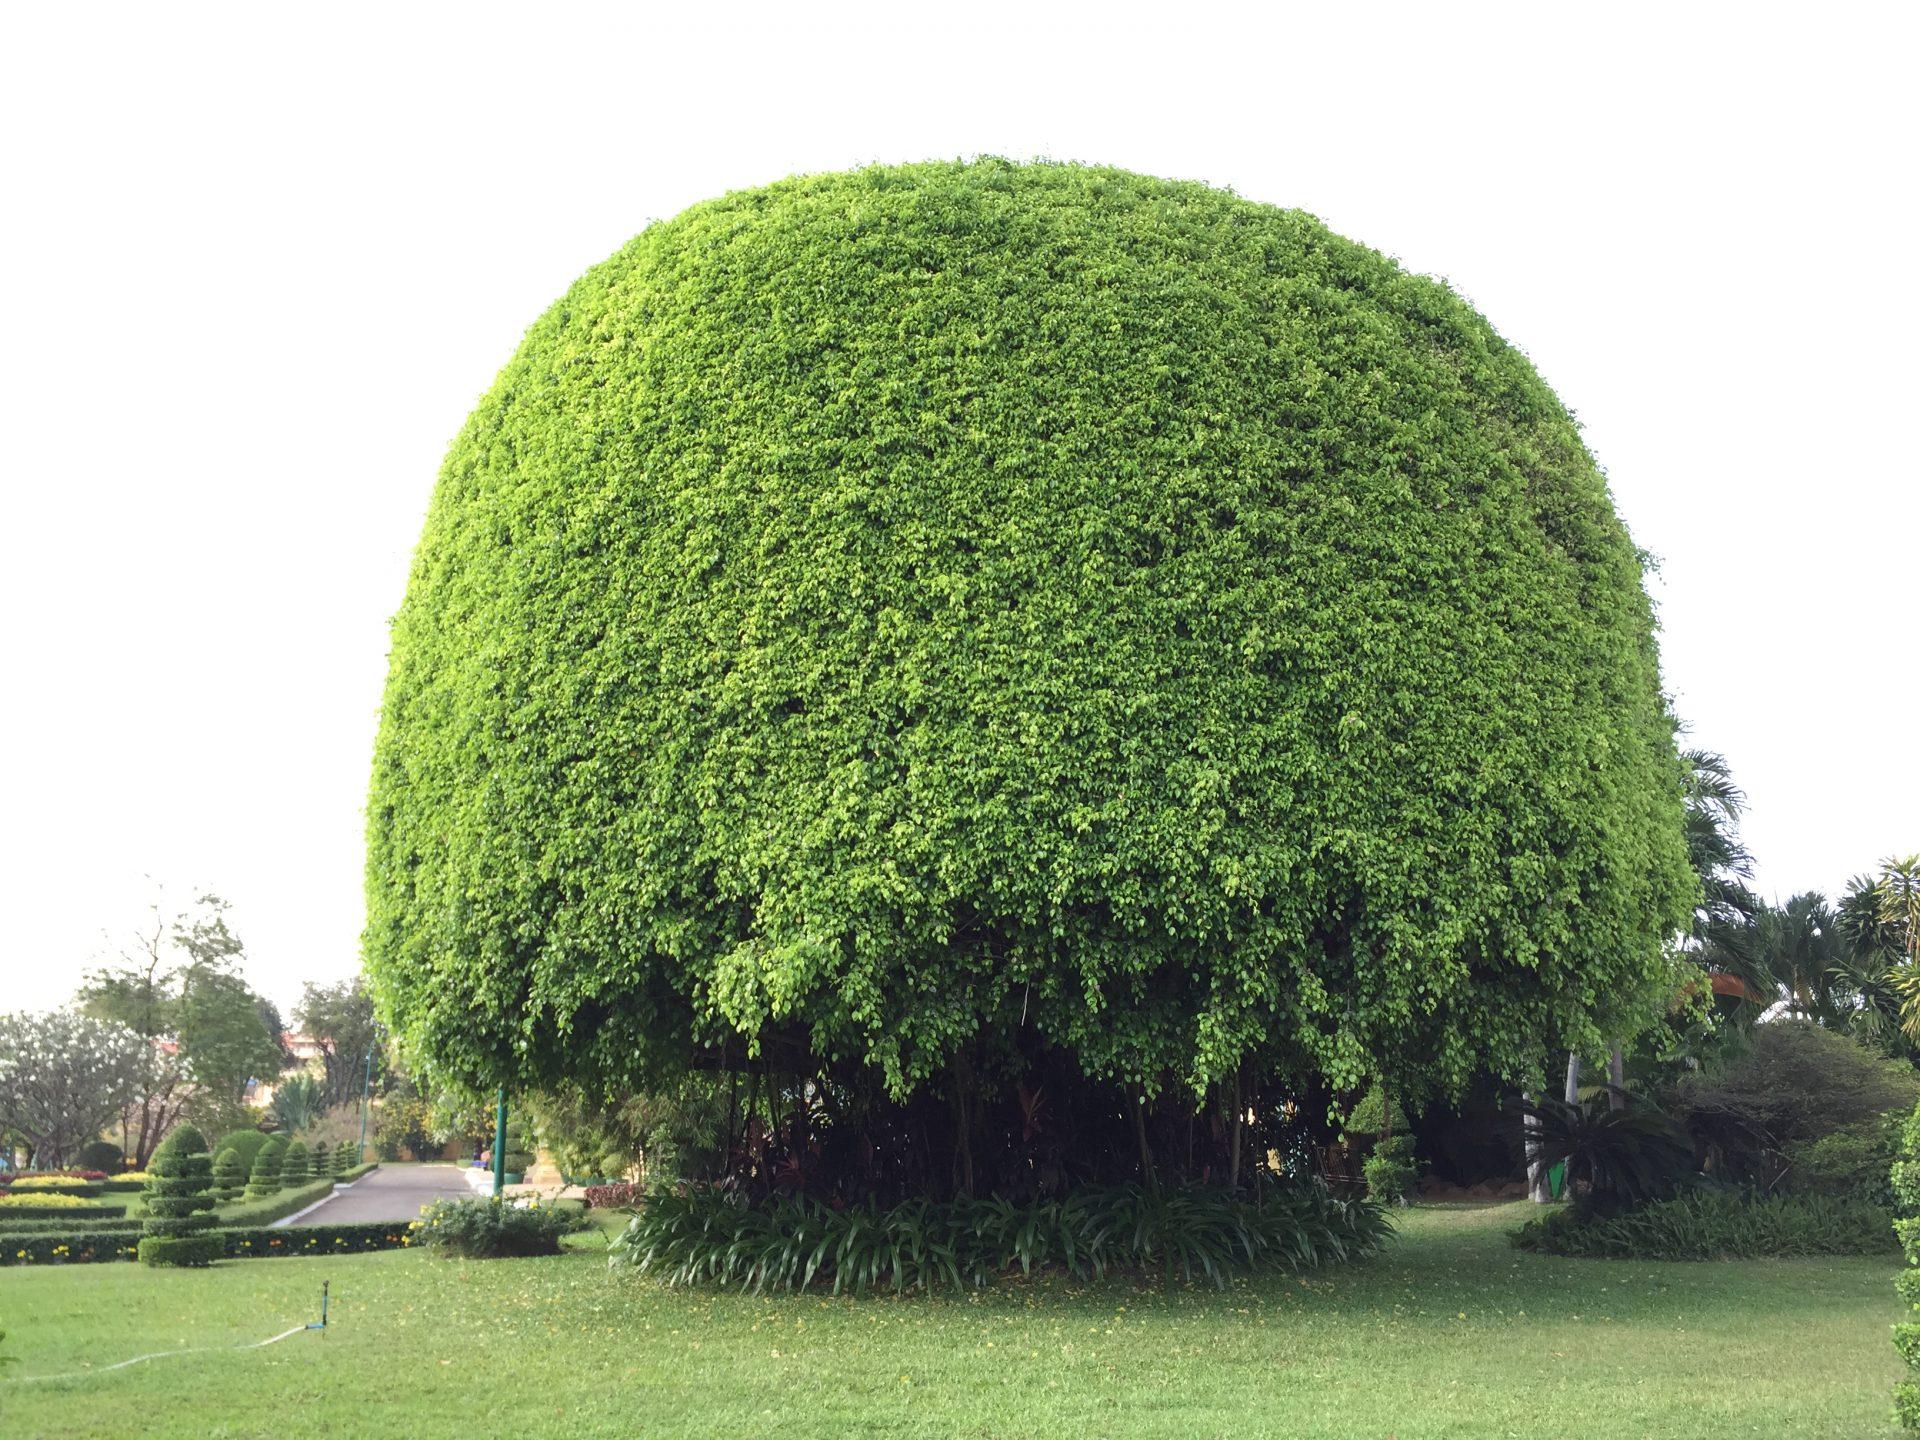 A mushroom-shaped tree in Royal Palace's garden, Phnom Penh